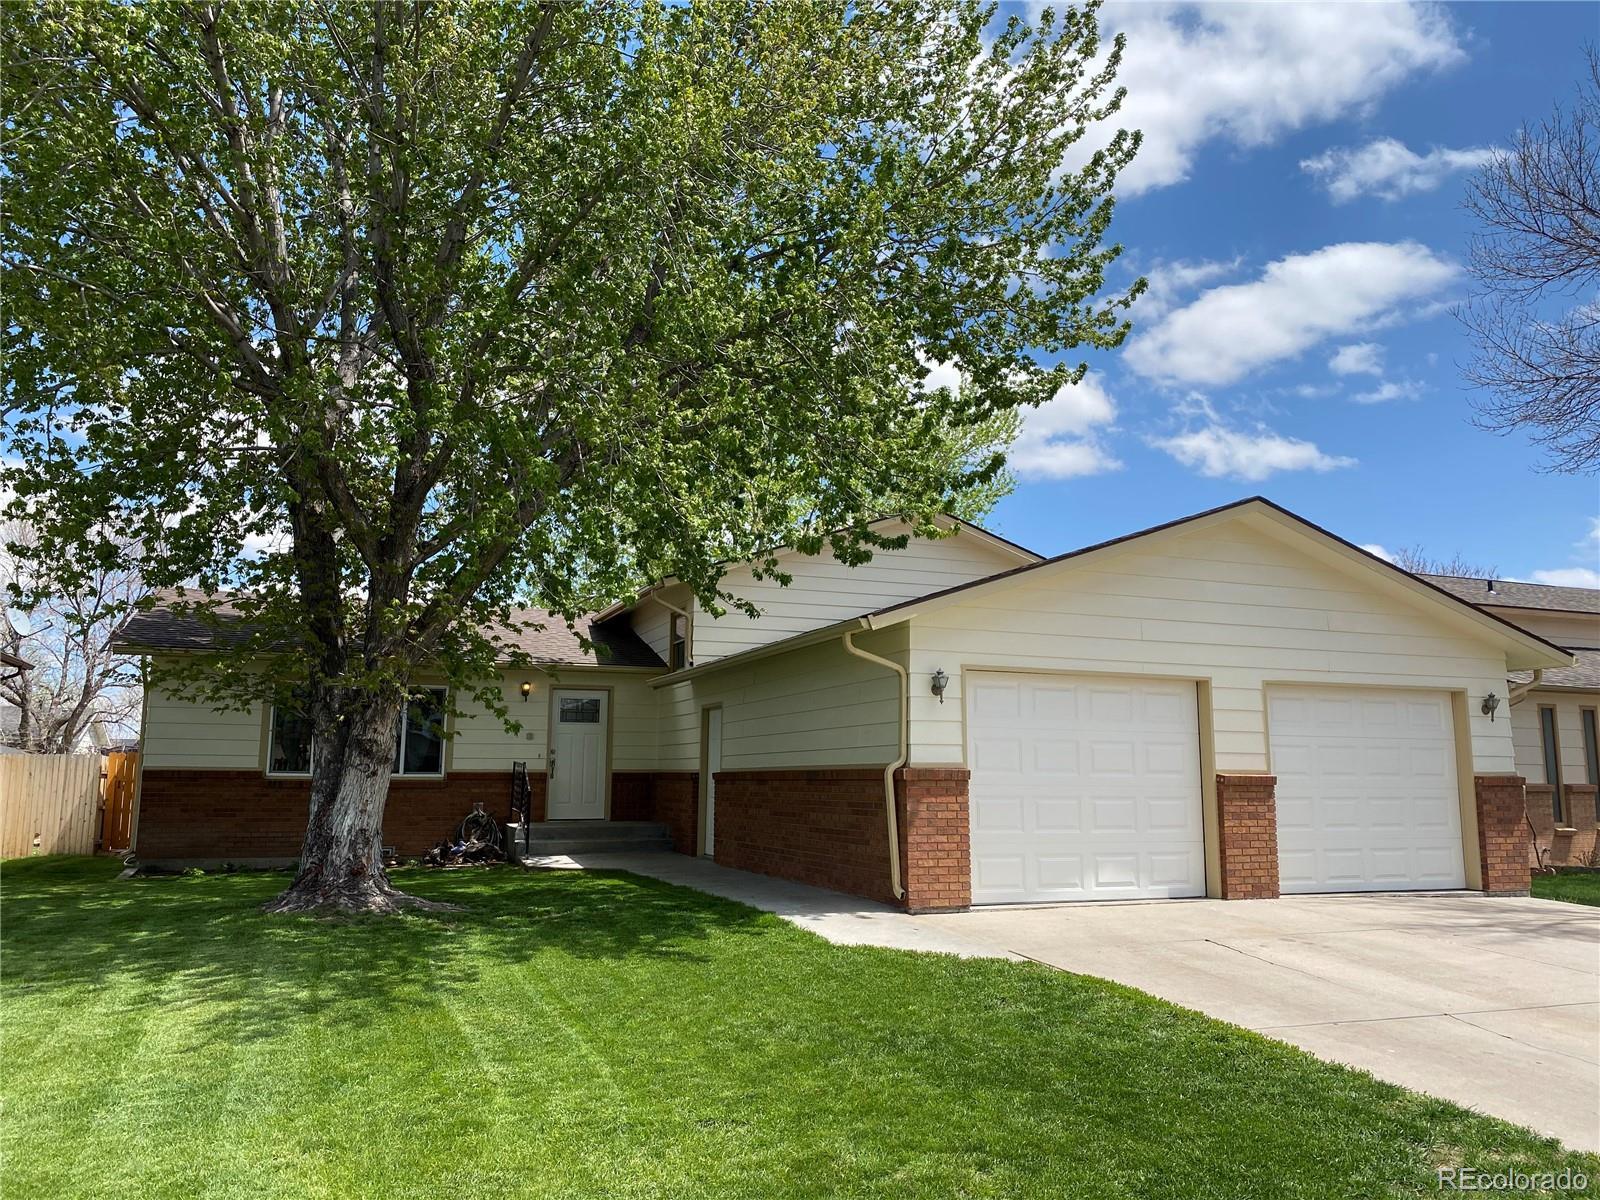 618 Dahlia Street, Fort Morgan, CO 80701 - Fort Morgan, CO real estate listing